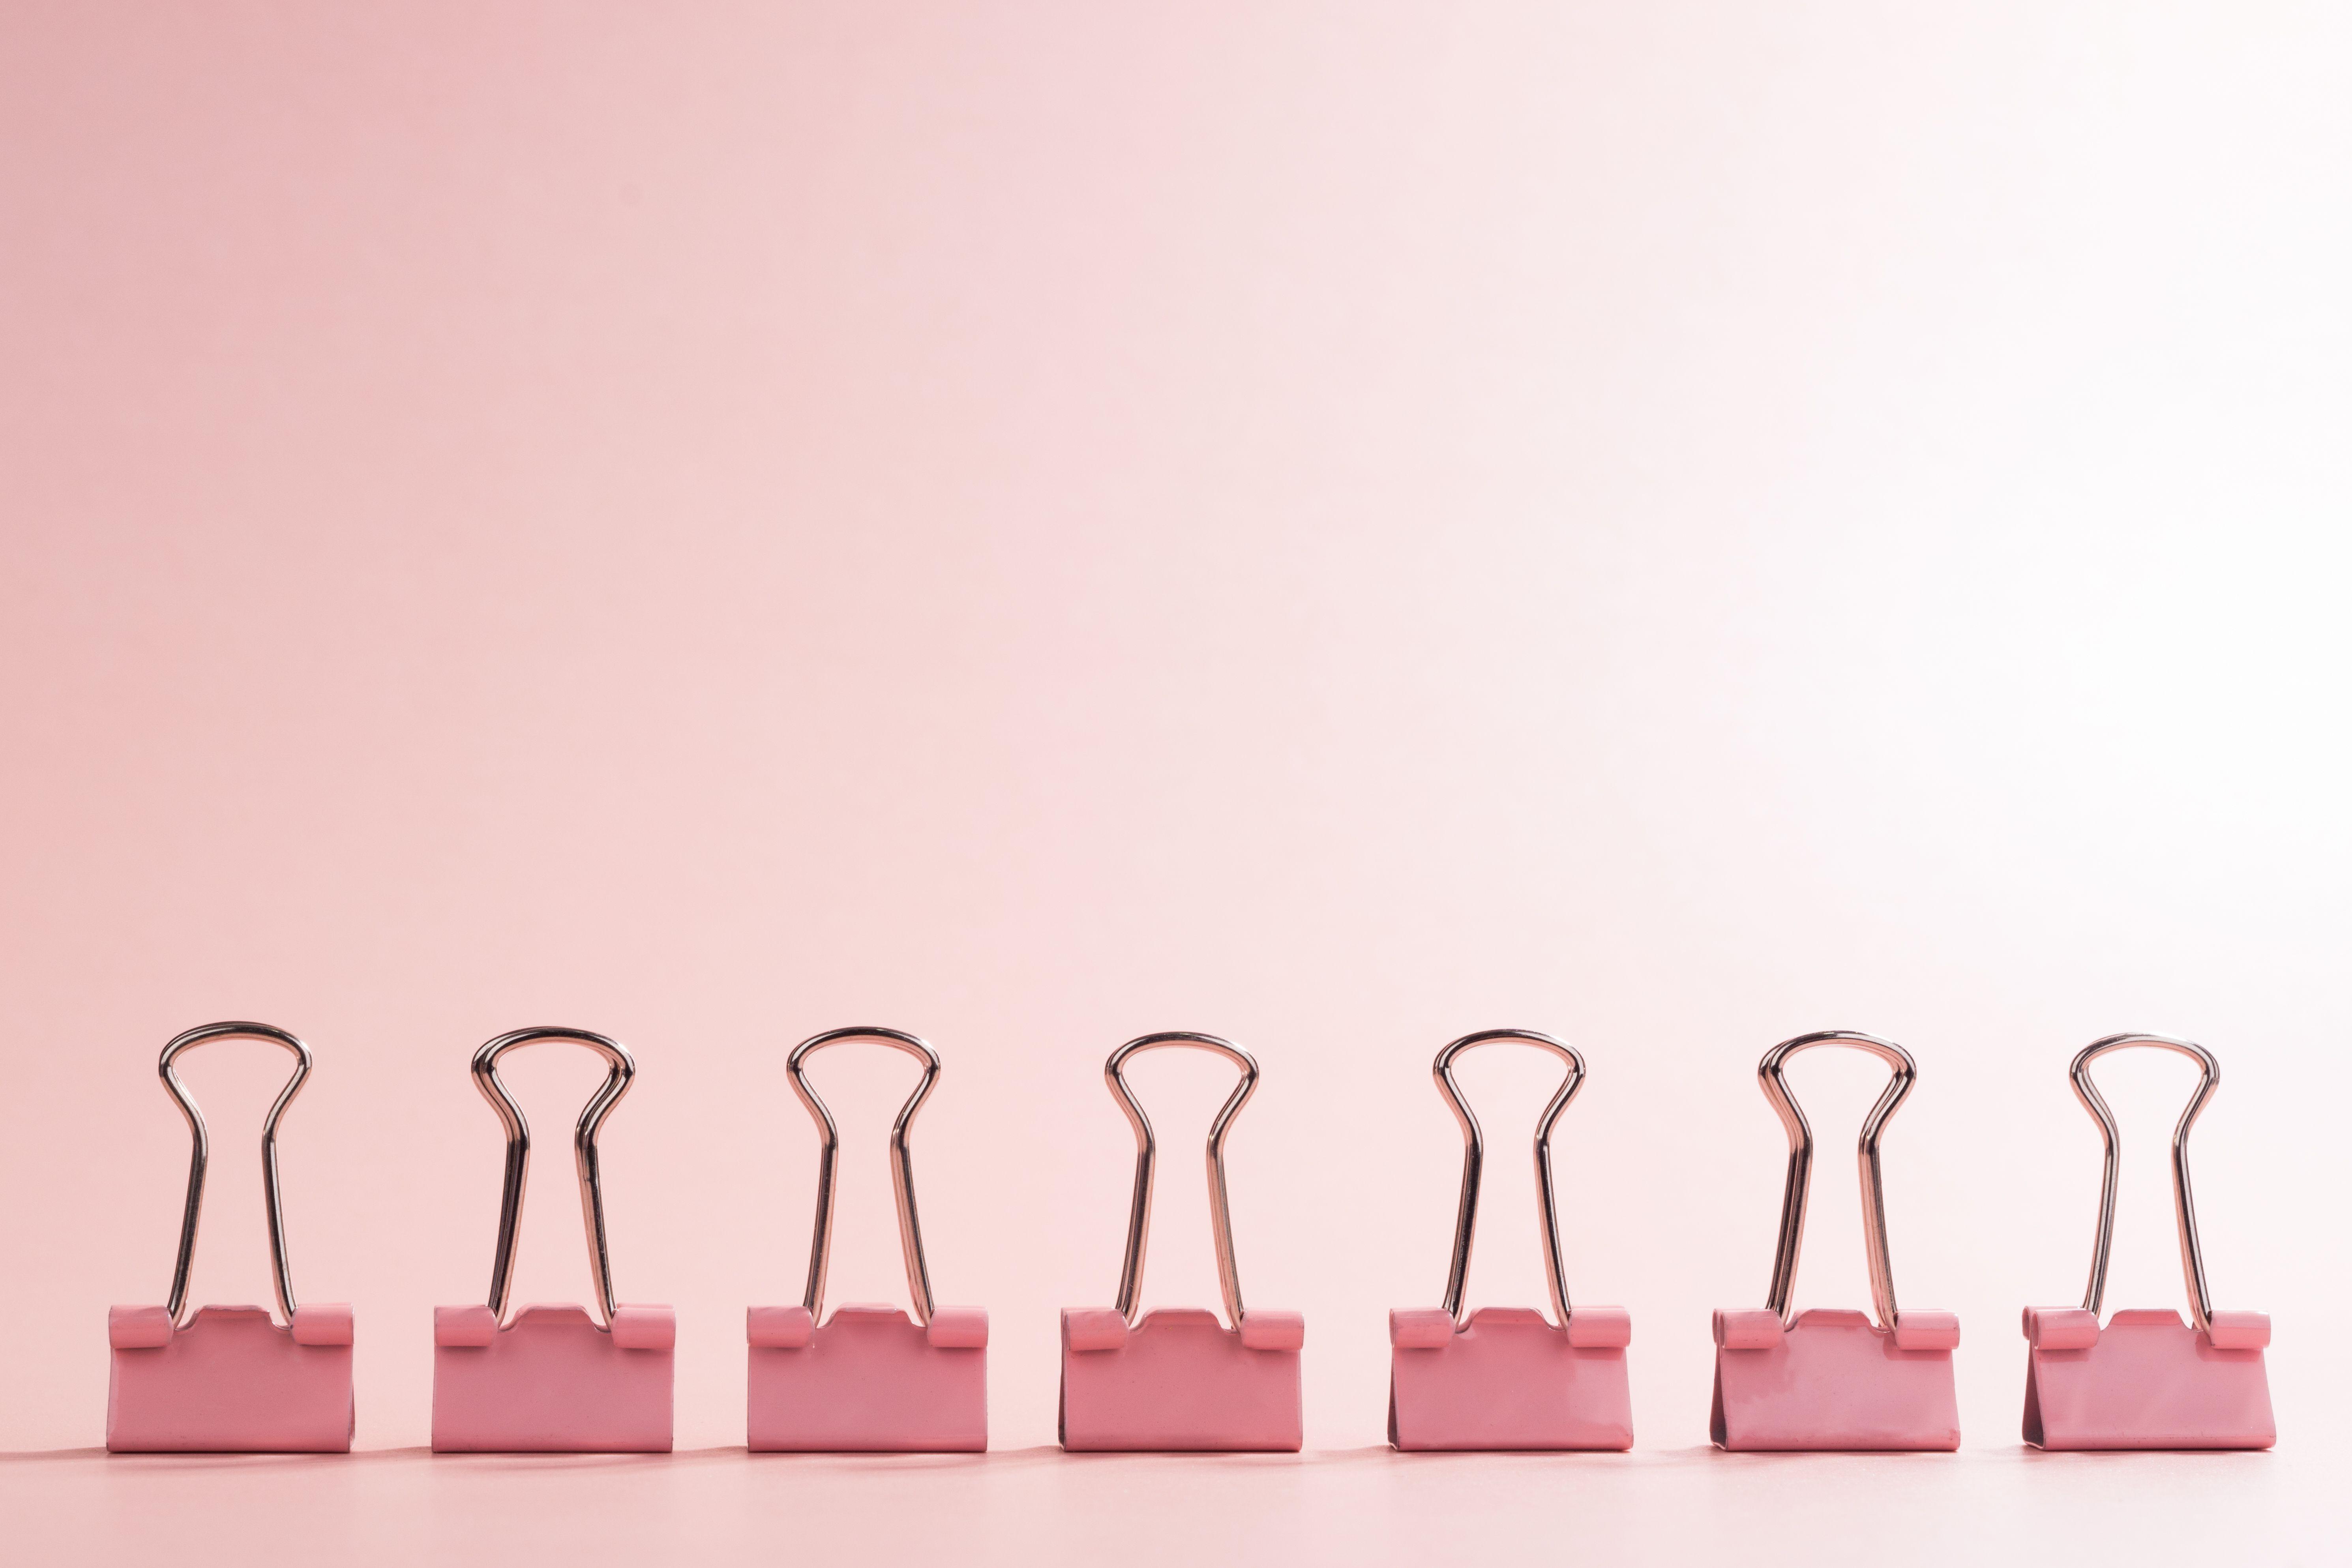 A Row of Binder Clip